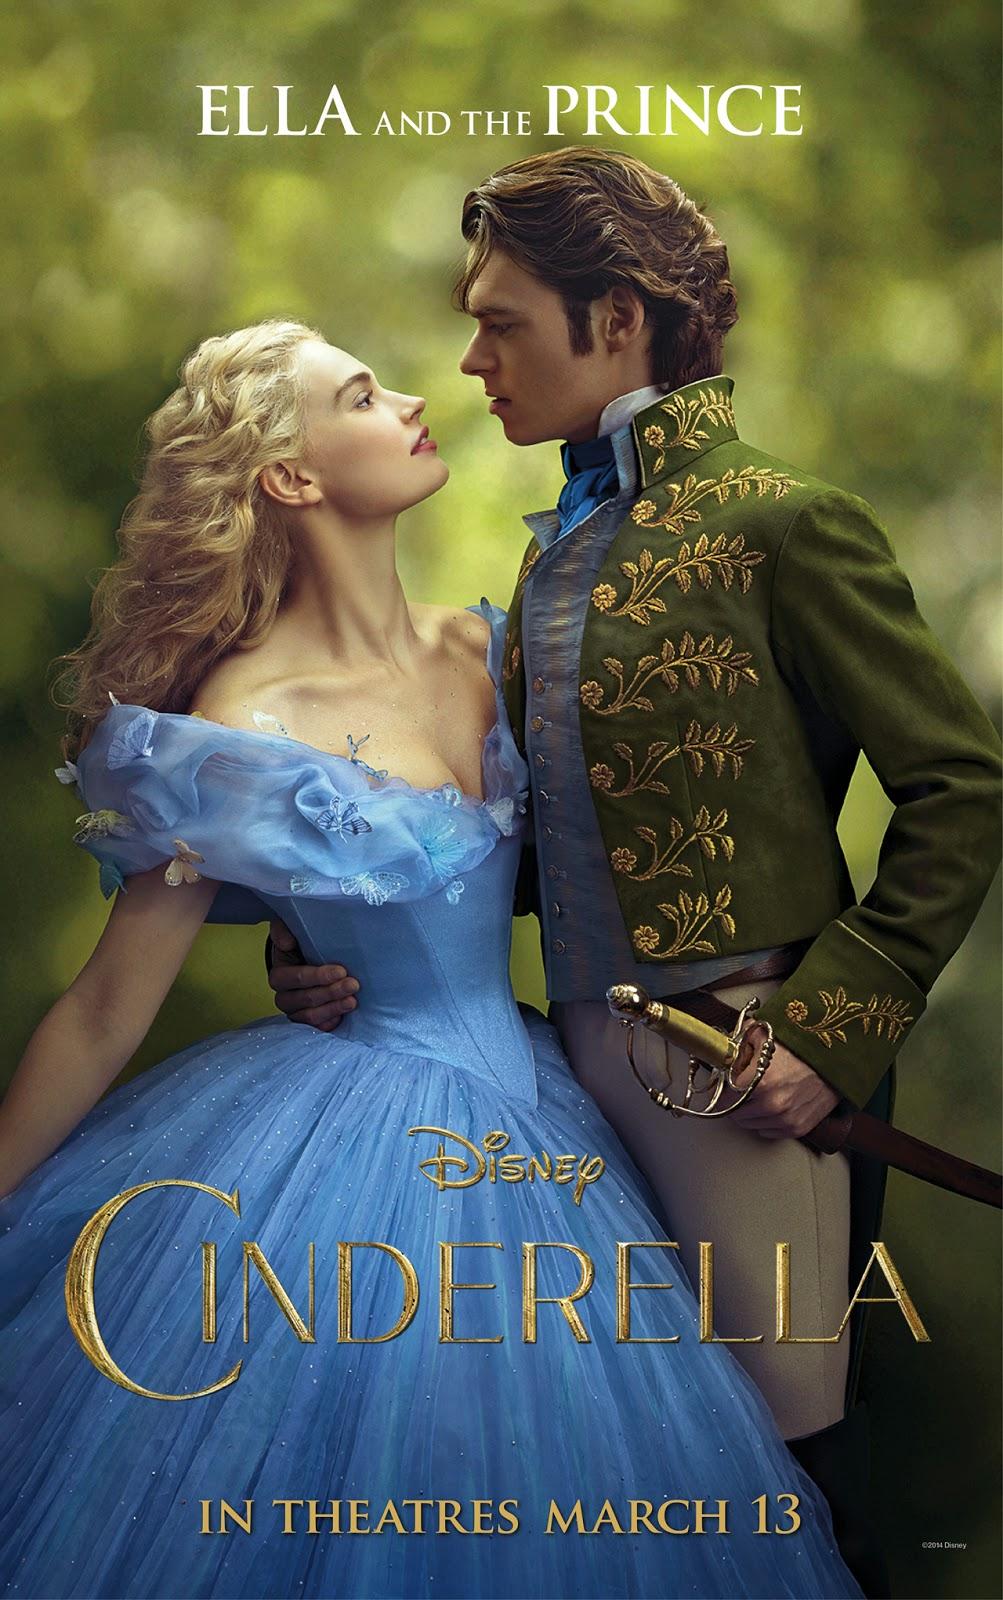 cinderella 2015 full movie free download